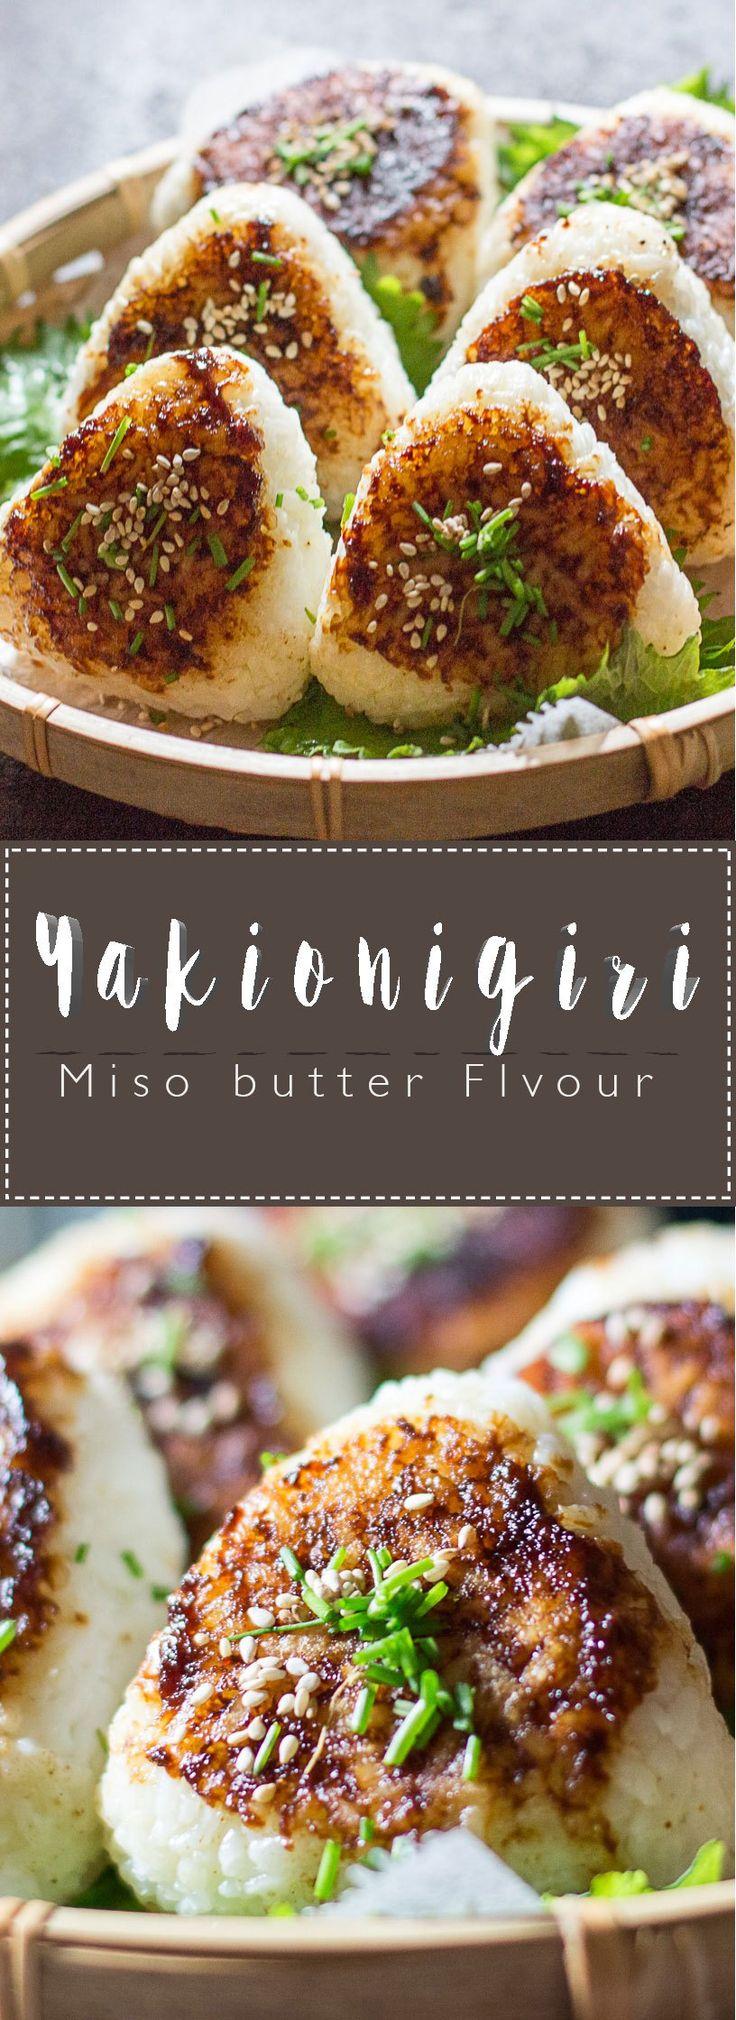 YAKI ONIGIRI (GRILLED RICE BALL) WITH MISO BUTTER SAUCE 焼きおにぎり味噌バター味